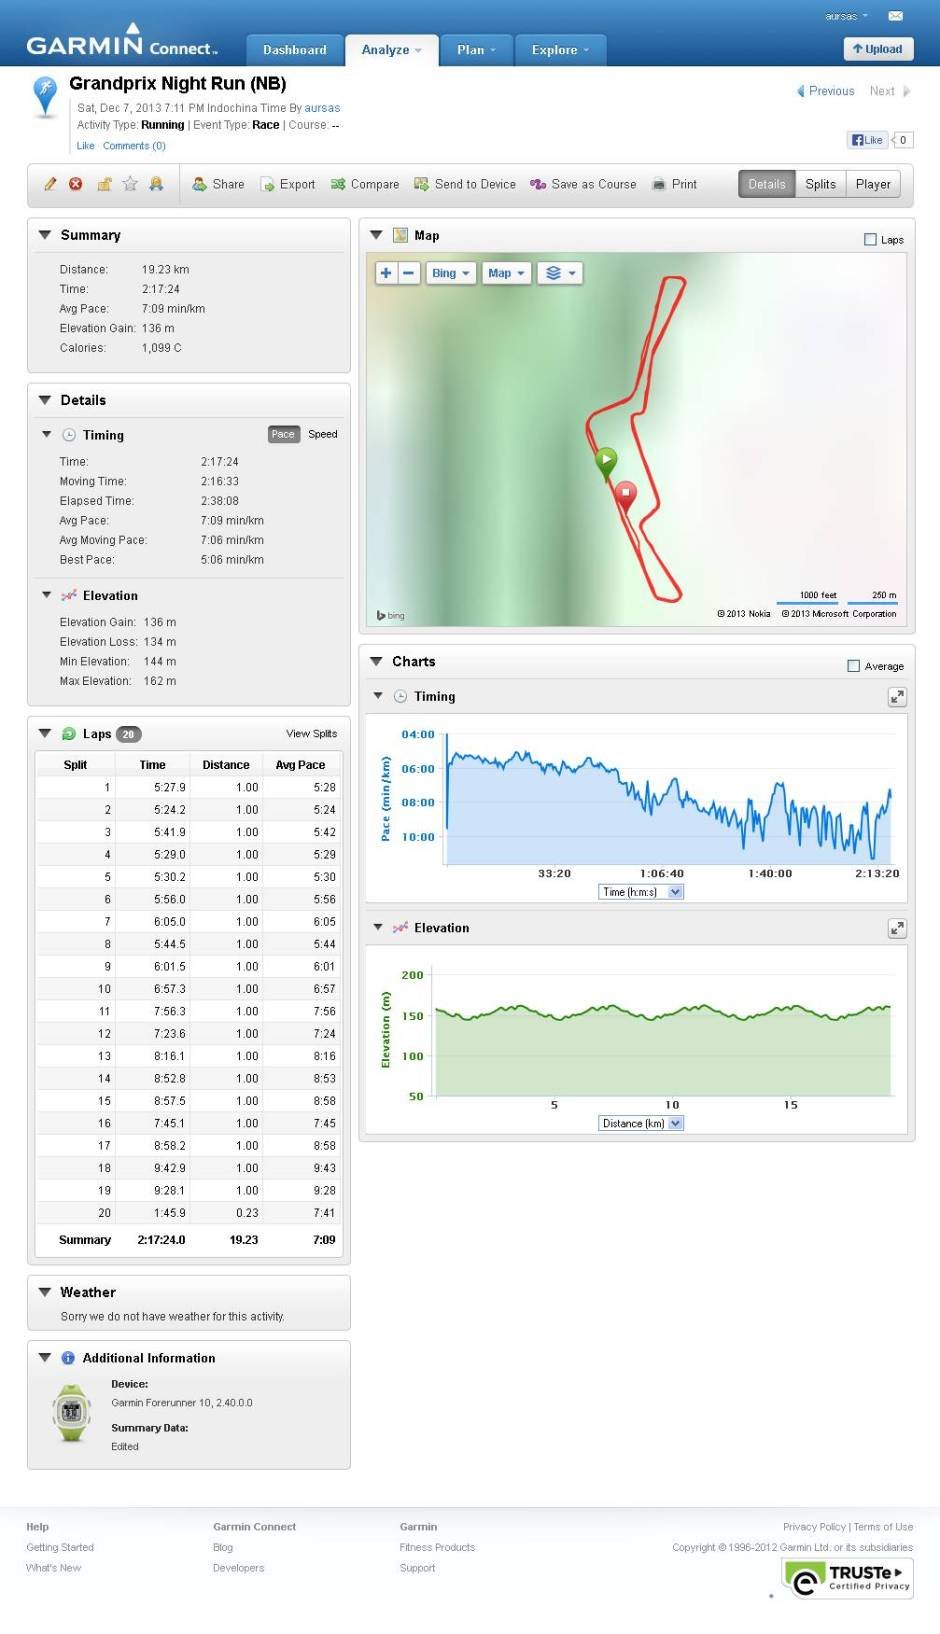 Grandprix Night Run (NB) by aursas at Garmin Connect - Details - 2013-12-08_11.52.41.png